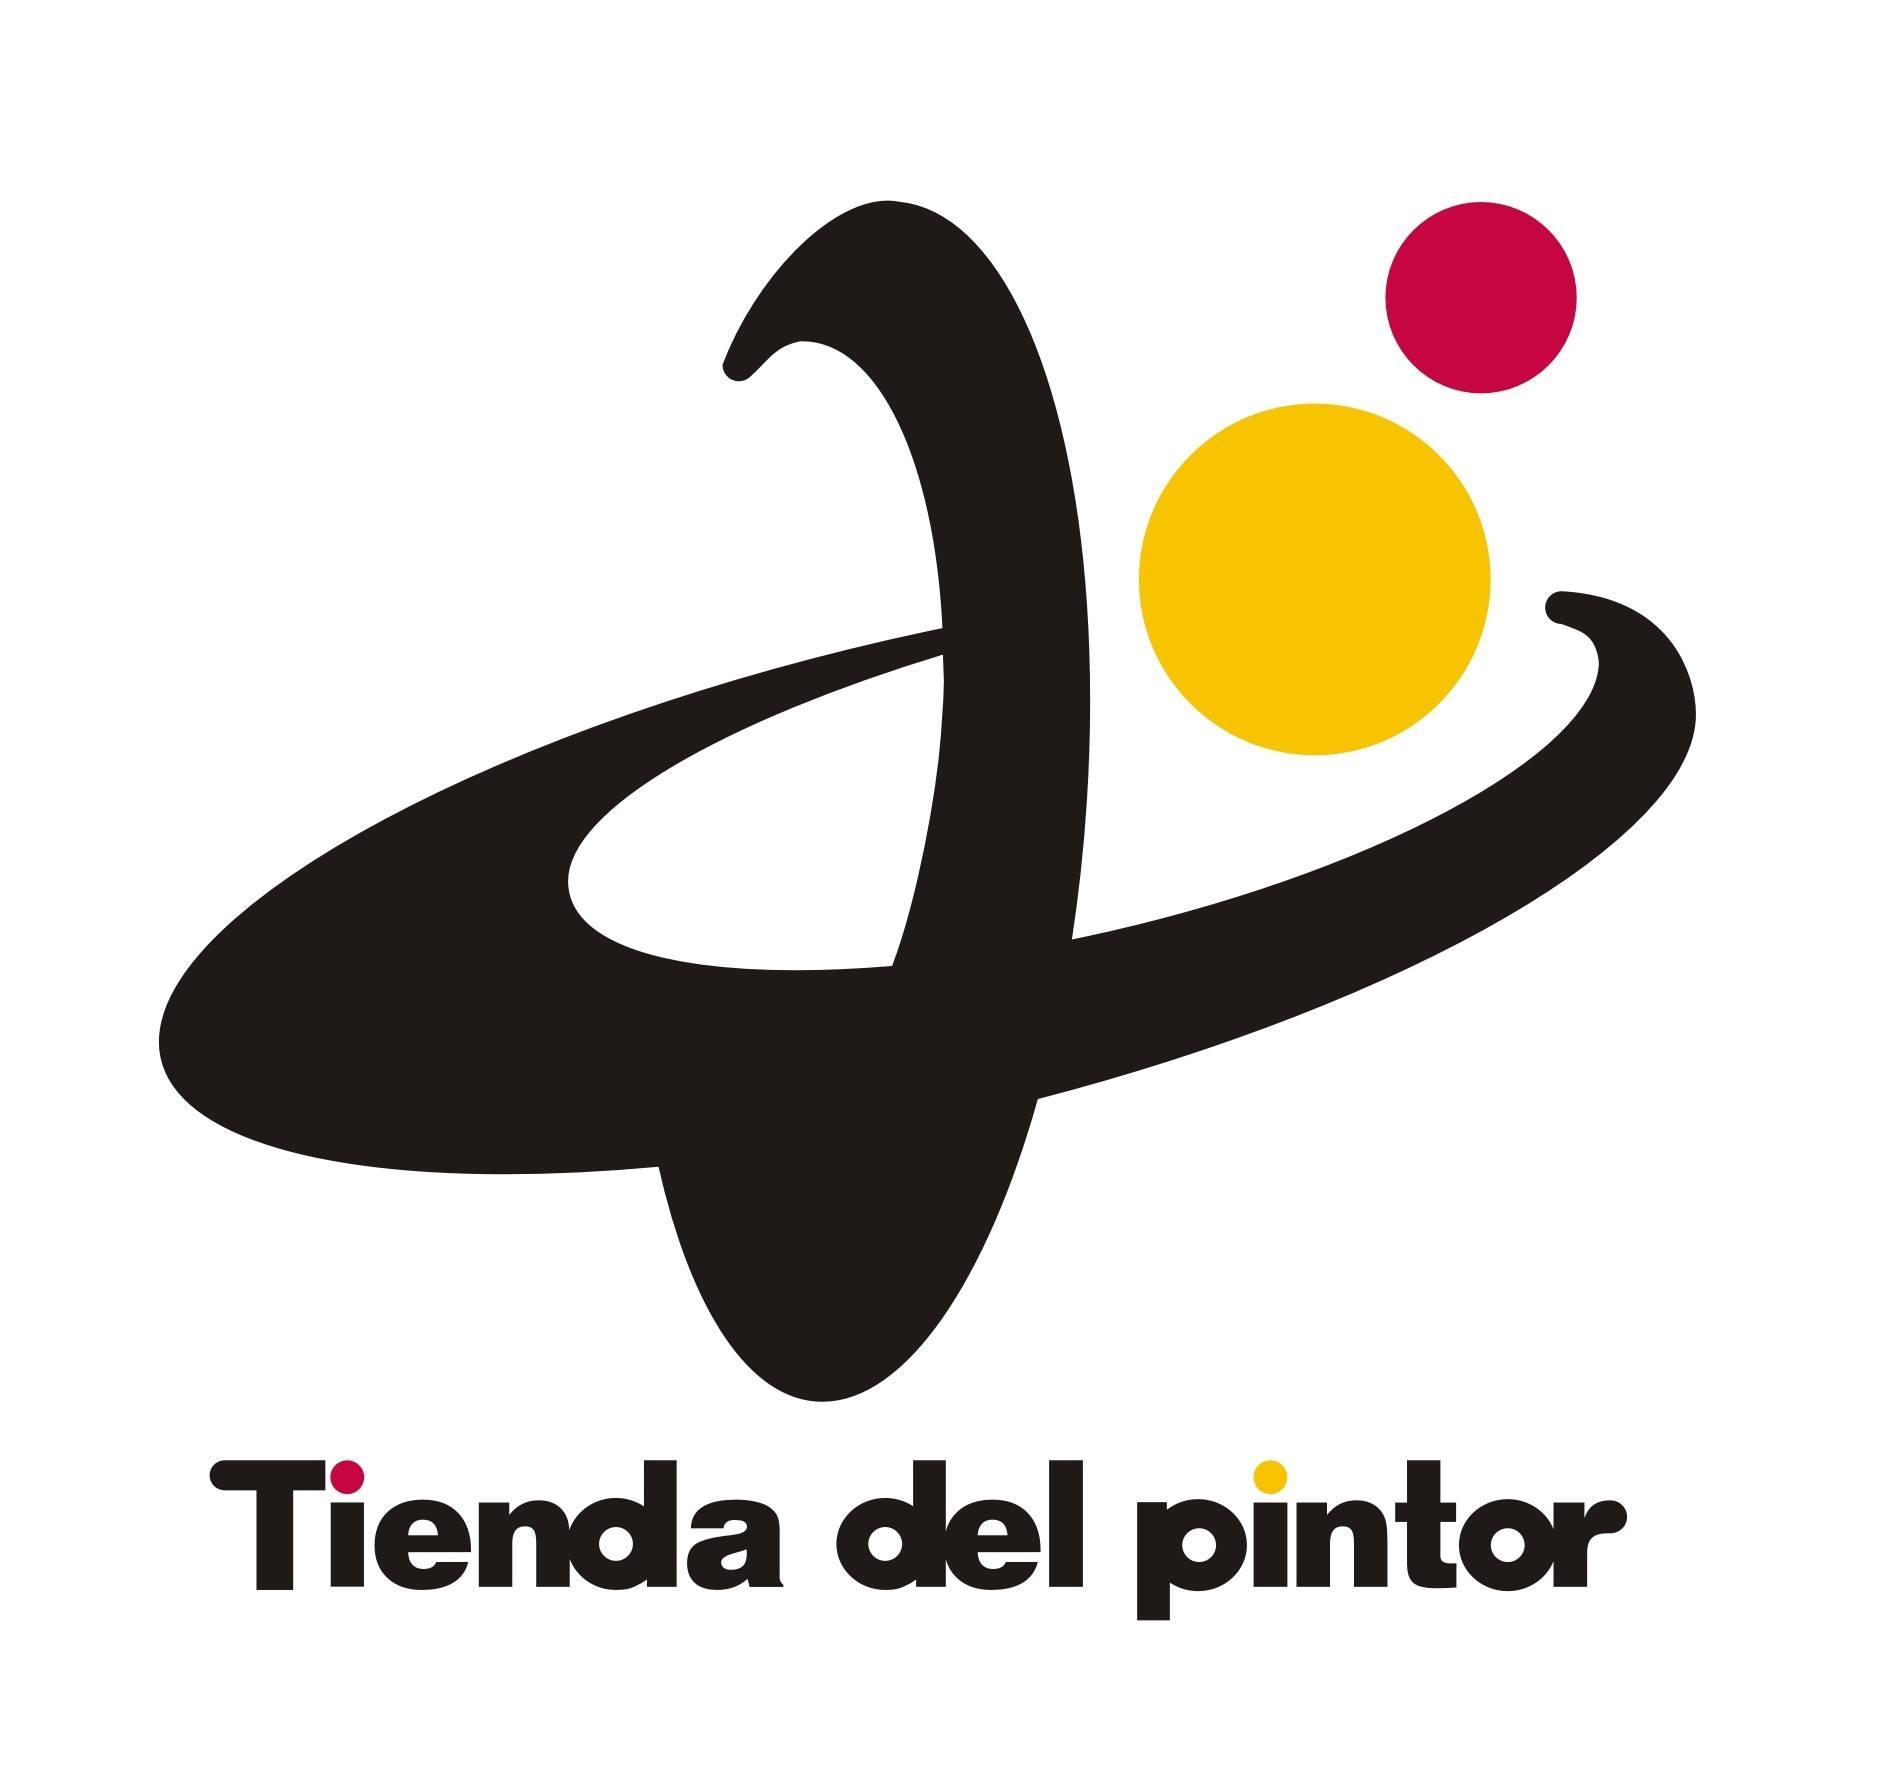 logo Tienda del Pintor.jpg